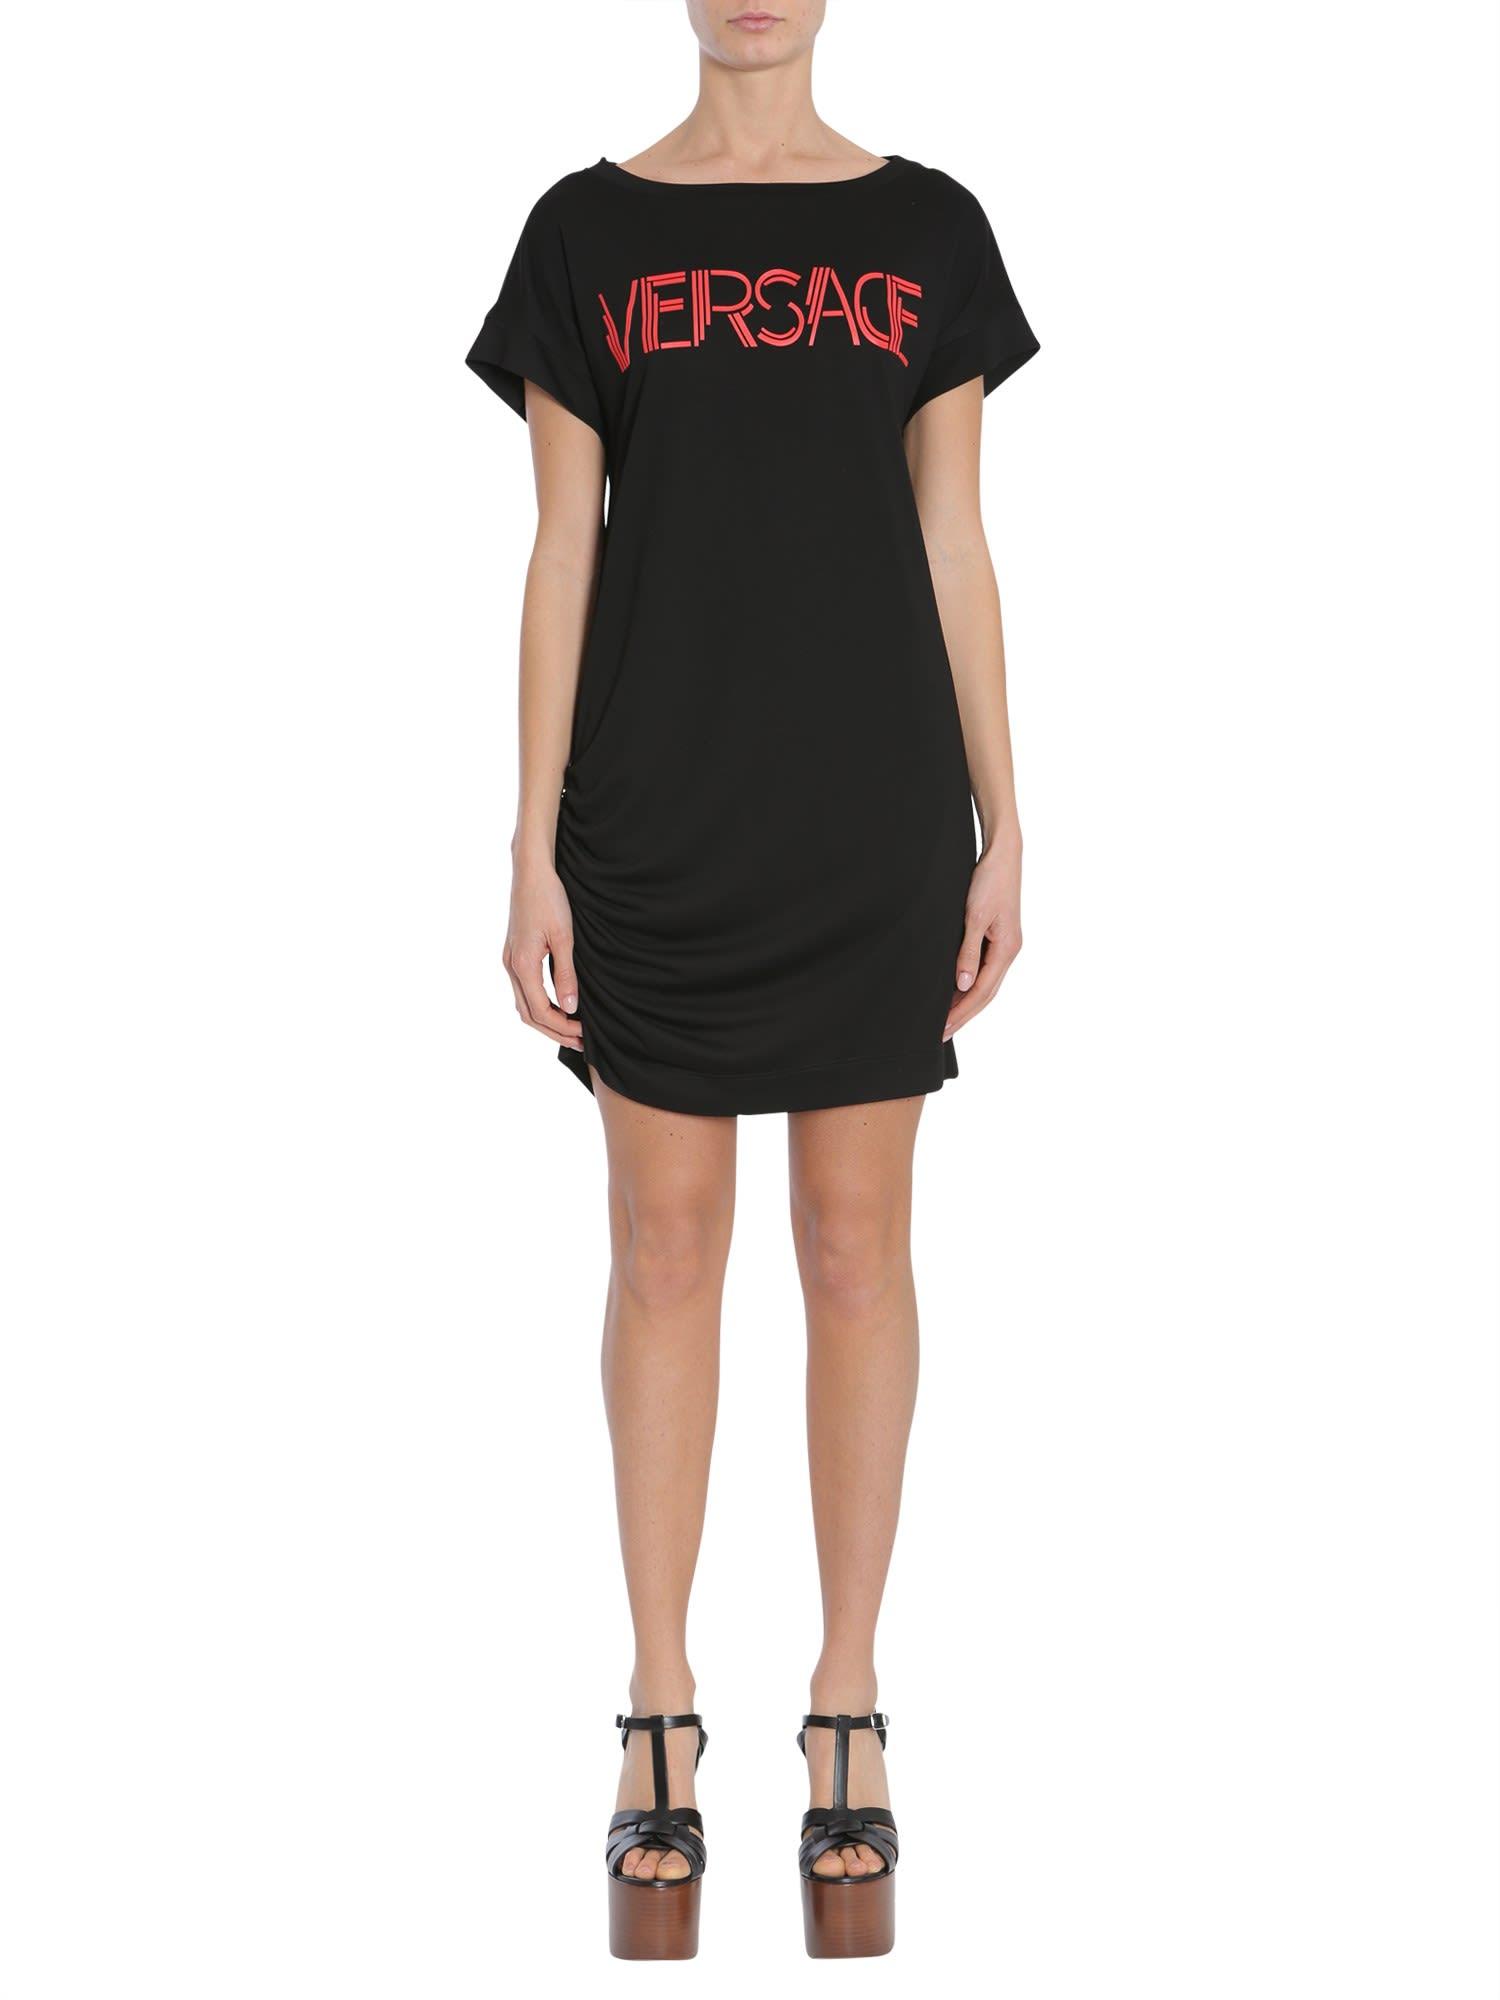 Versace T-shirt Dress With Logo